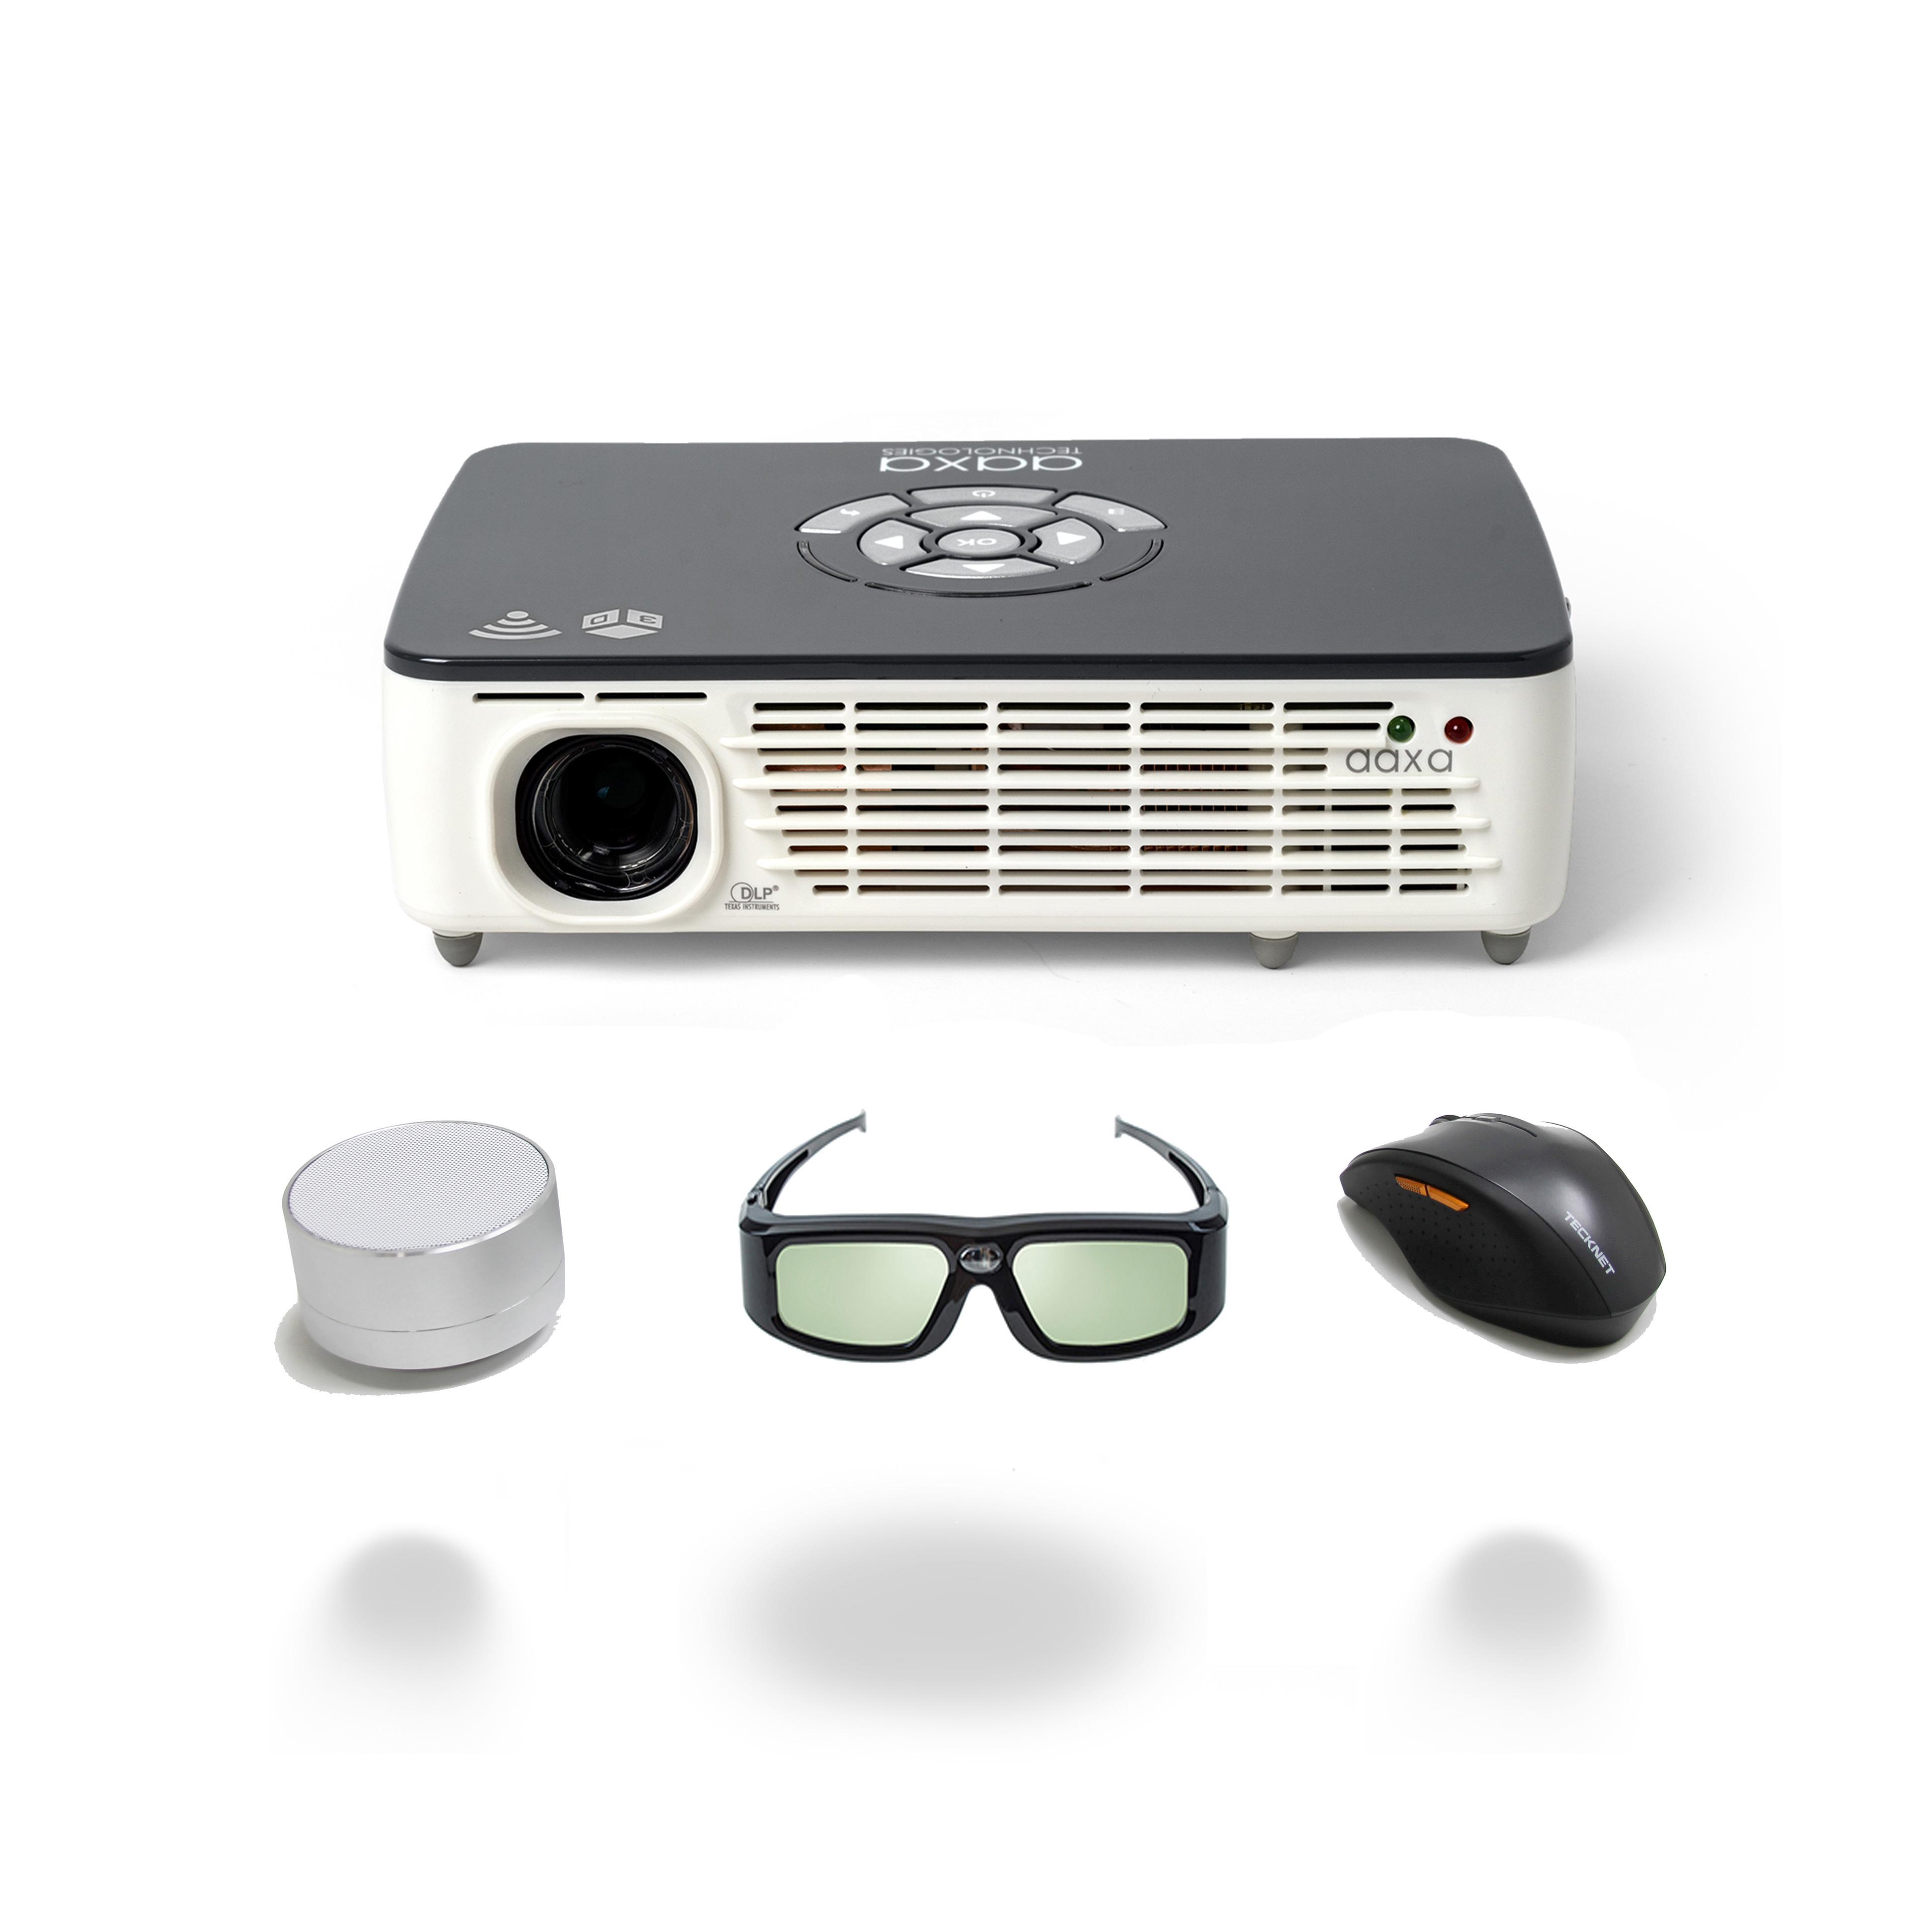 Texas instruments dlp technology projectors pico html for Texas instruments mini projector